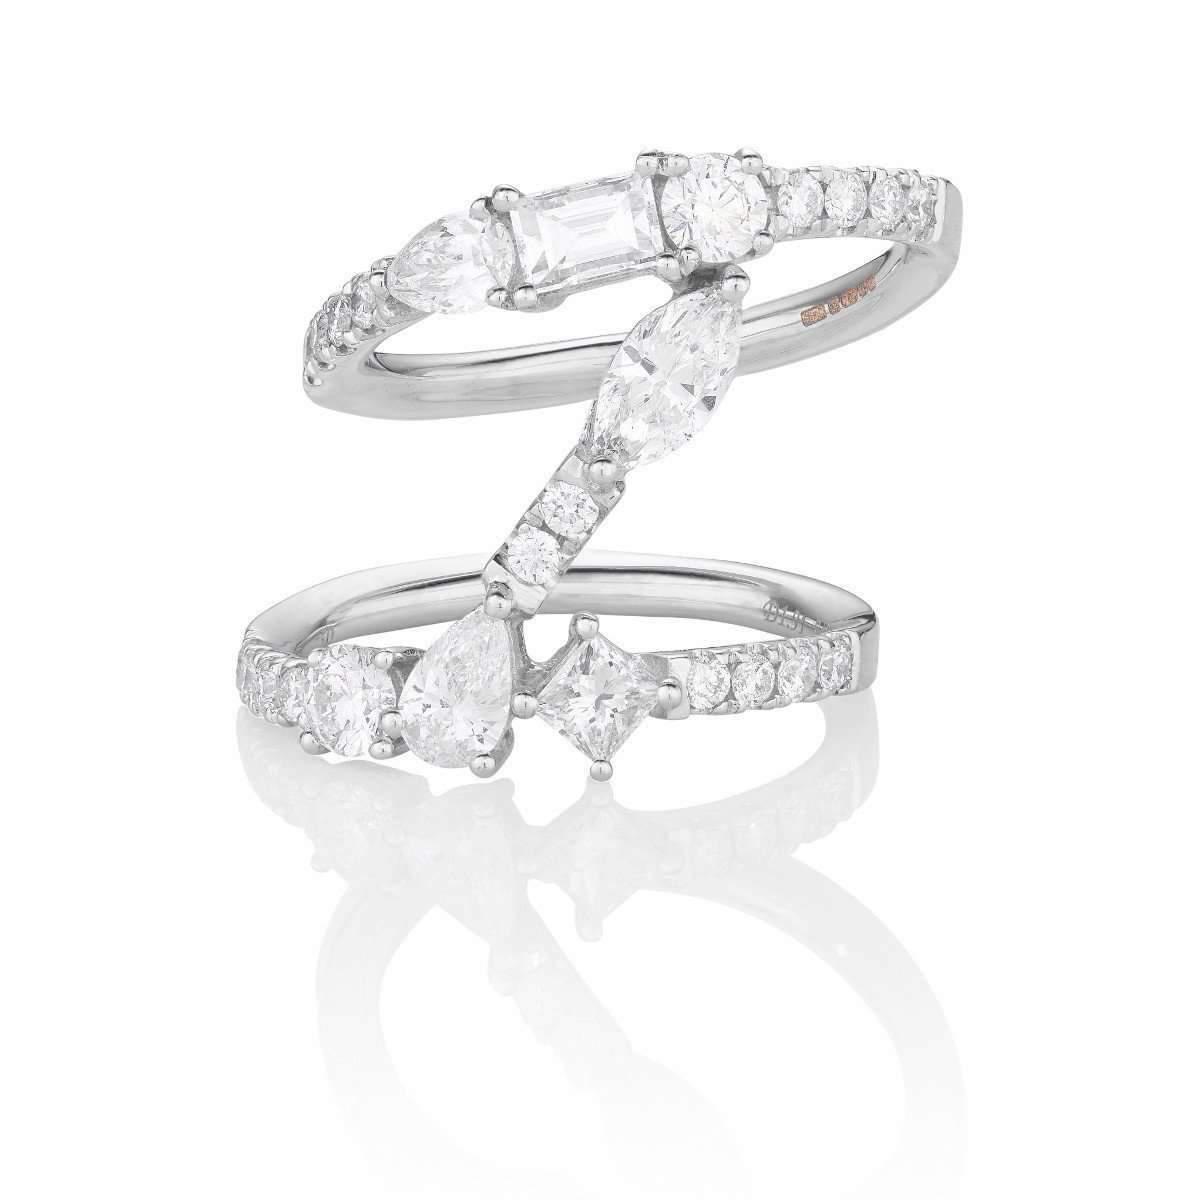 Sarah Ho Numerati Fancy Diamond Lucky Number 3 - UK M - US 6 - EU 52 3/4 WVJdYs